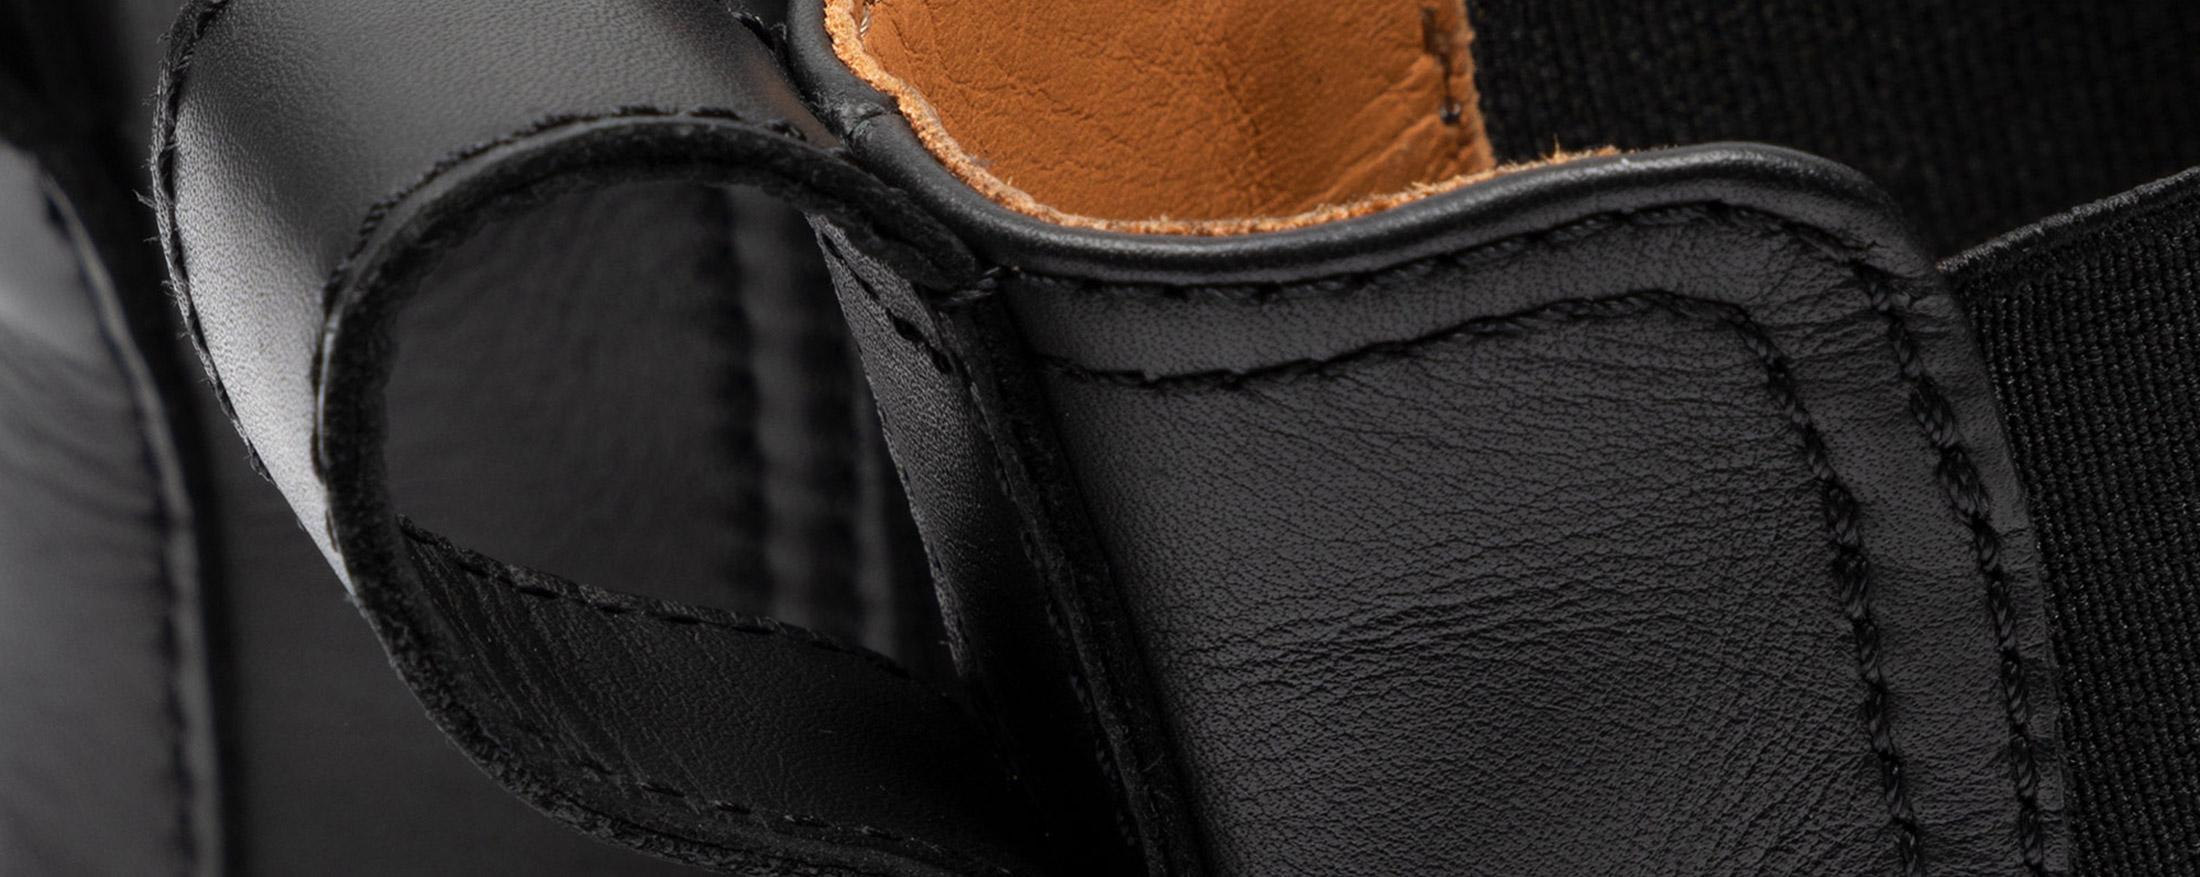 Teym-Care-Leather